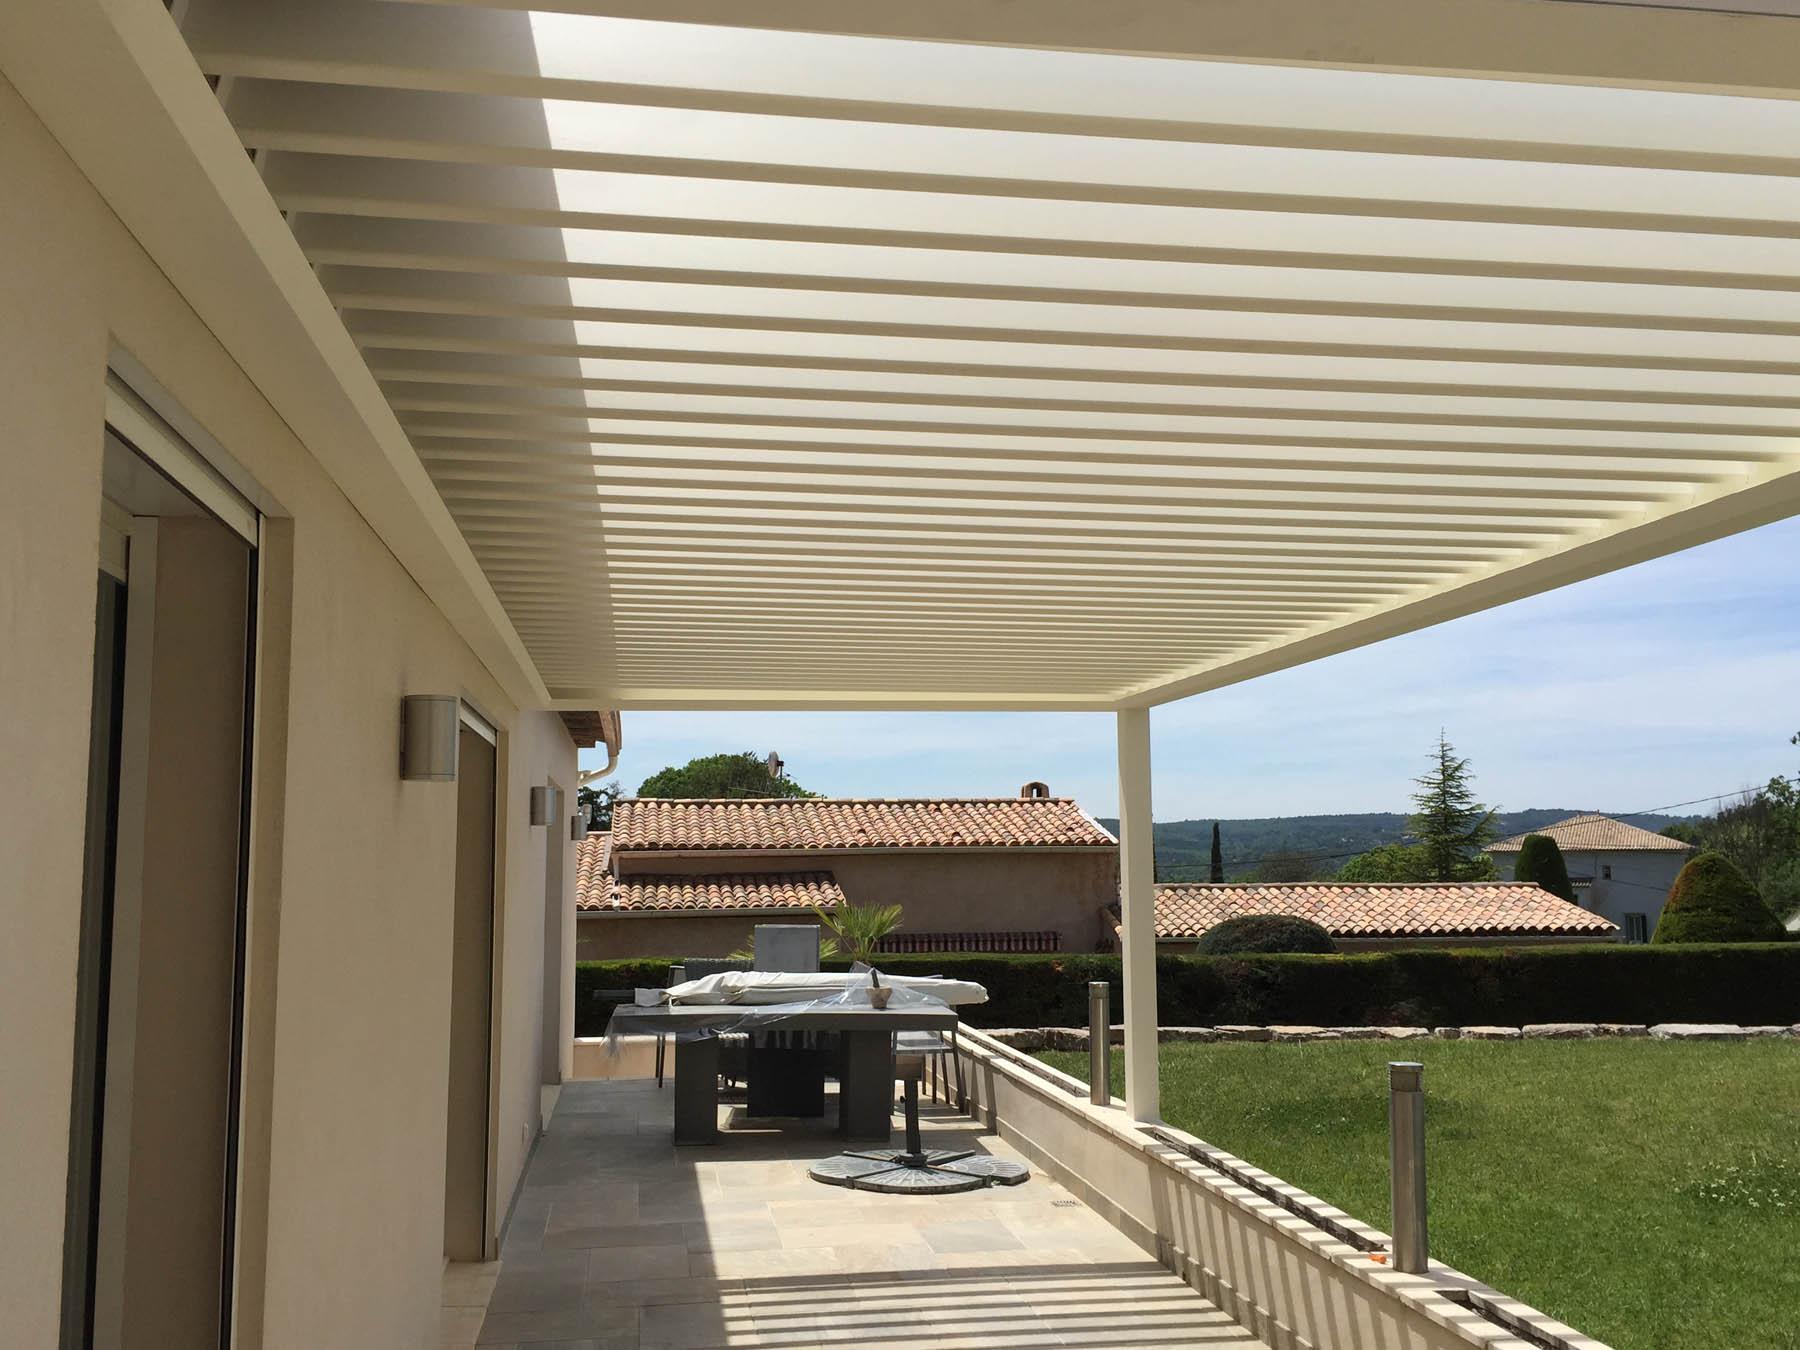 pergolas installateur pergolas bioclimatique cannes 06 grasse nice. Black Bedroom Furniture Sets. Home Design Ideas